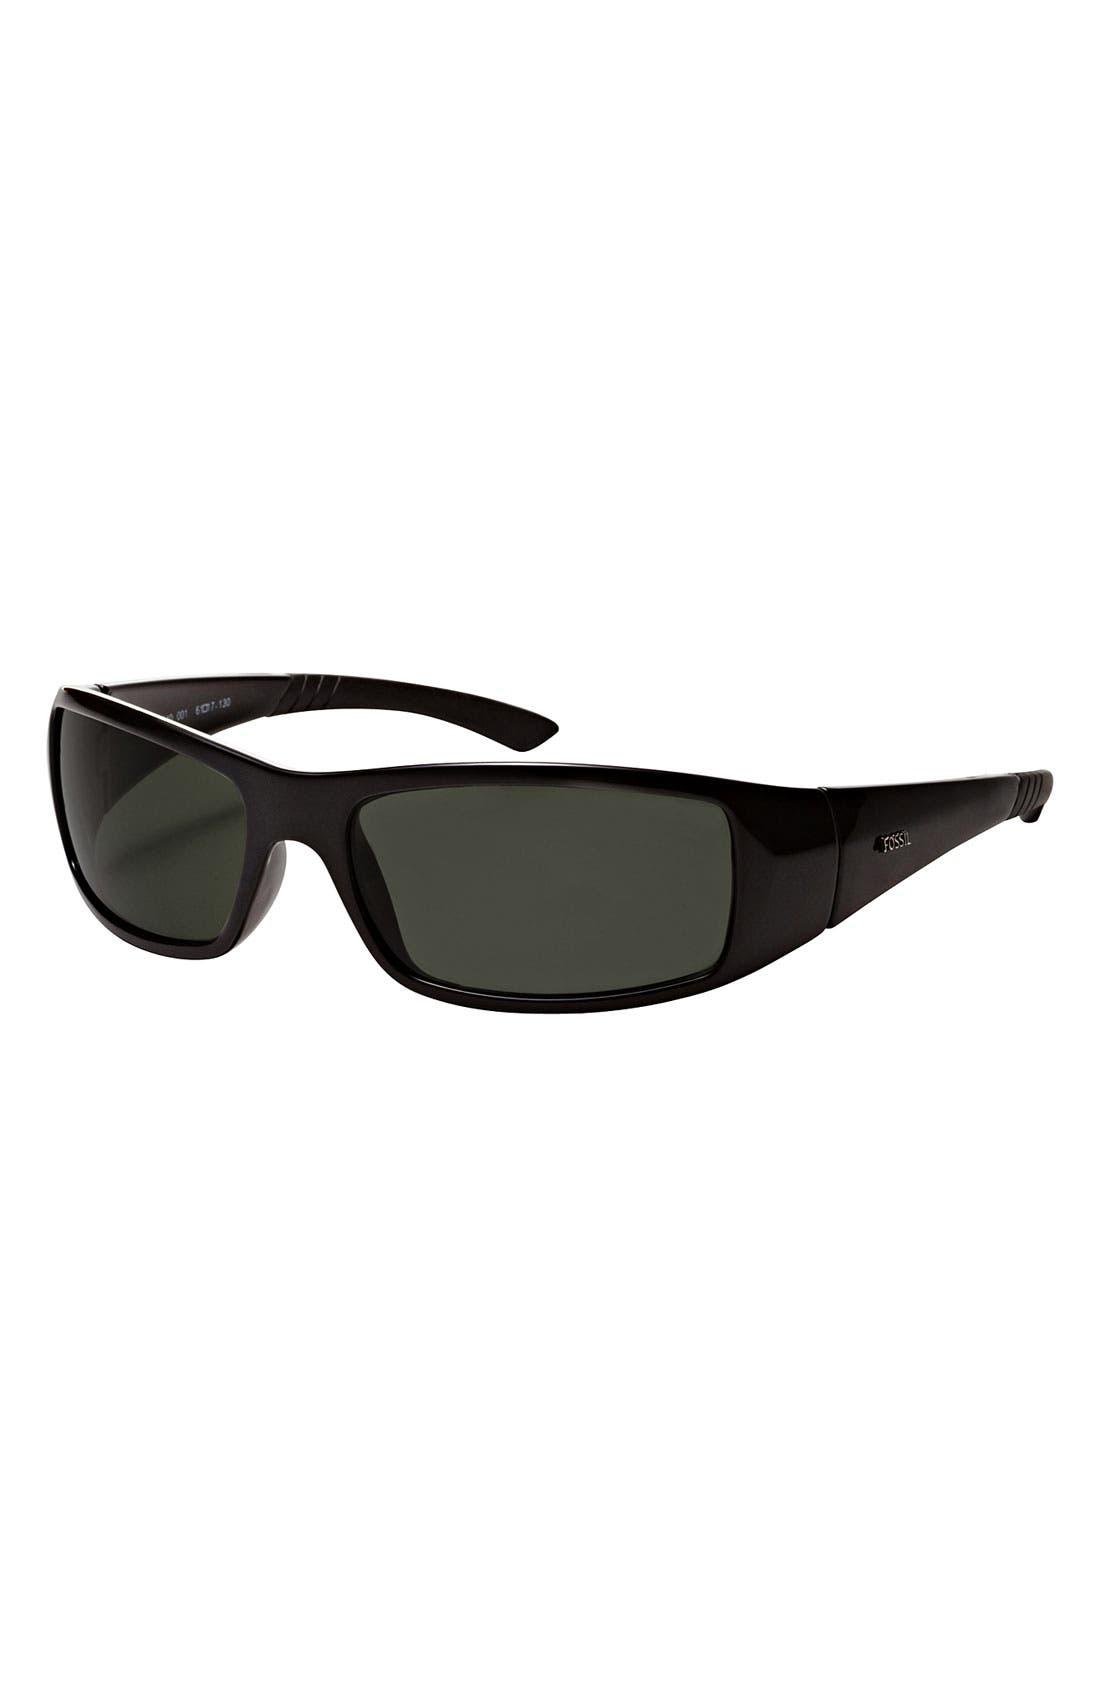 'Patrick' Sunglasses,                             Main thumbnail 1, color,                             001